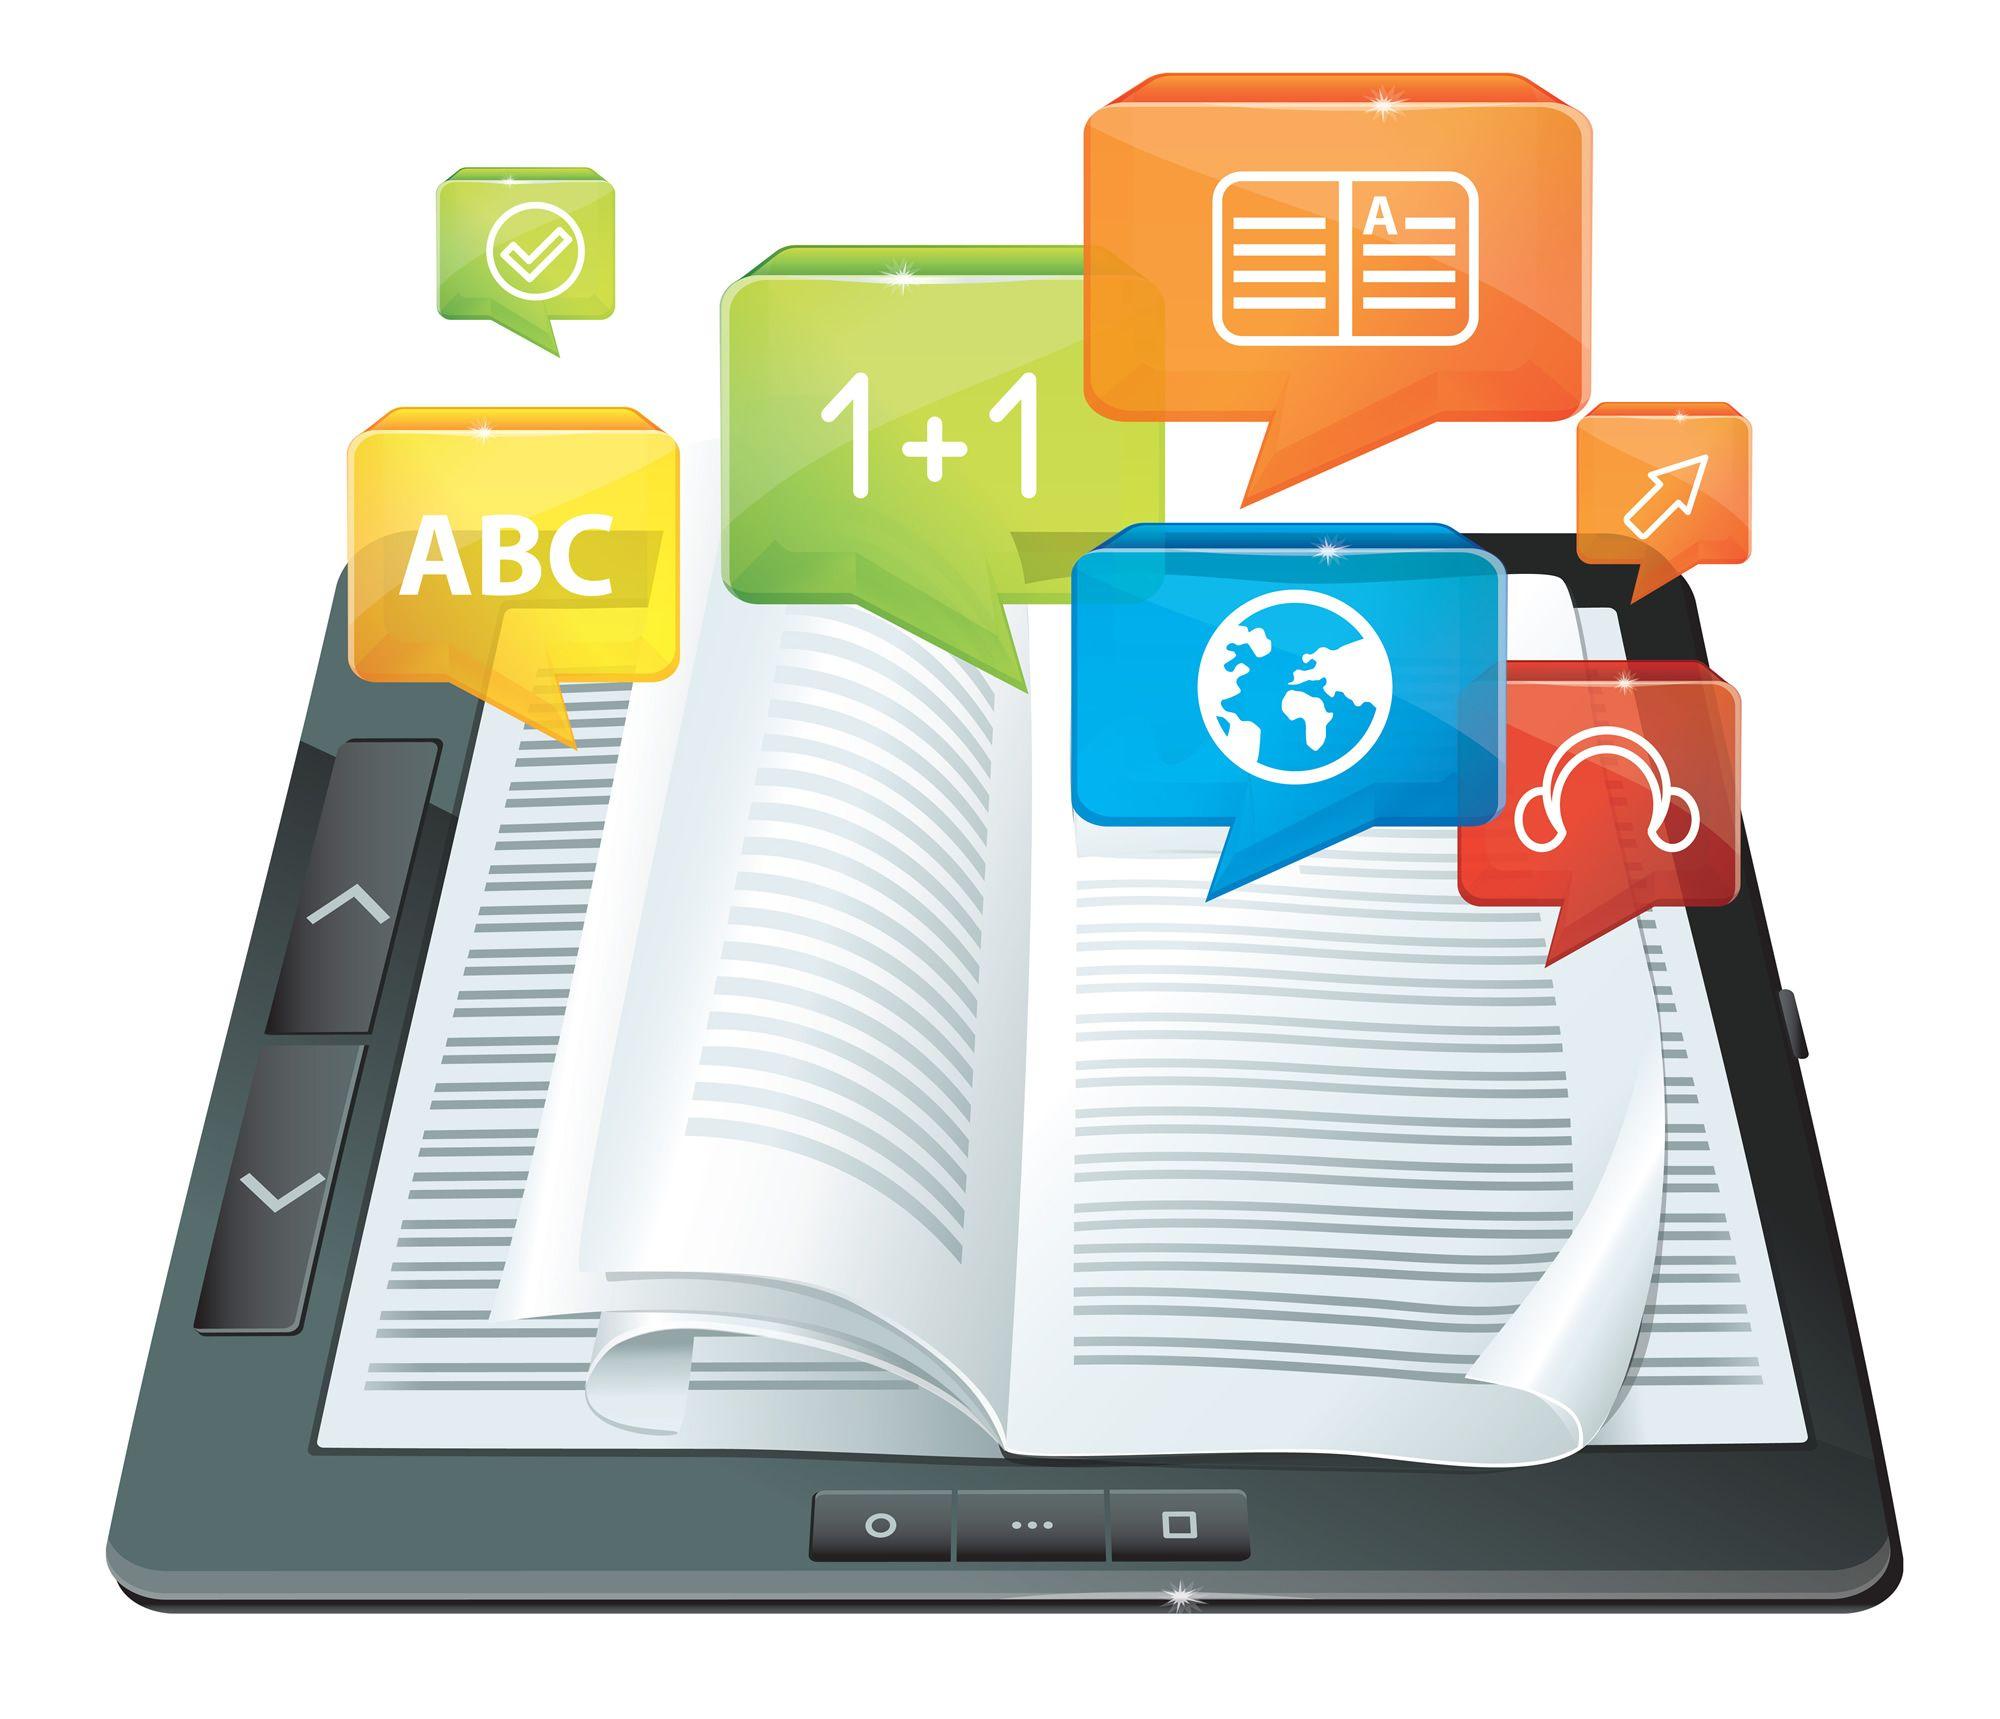 E-textbook Rental Market to Witness Huge Growth by 2020-2026 | TextbookRush, CengageBrain, Bloomsbury, Chegg